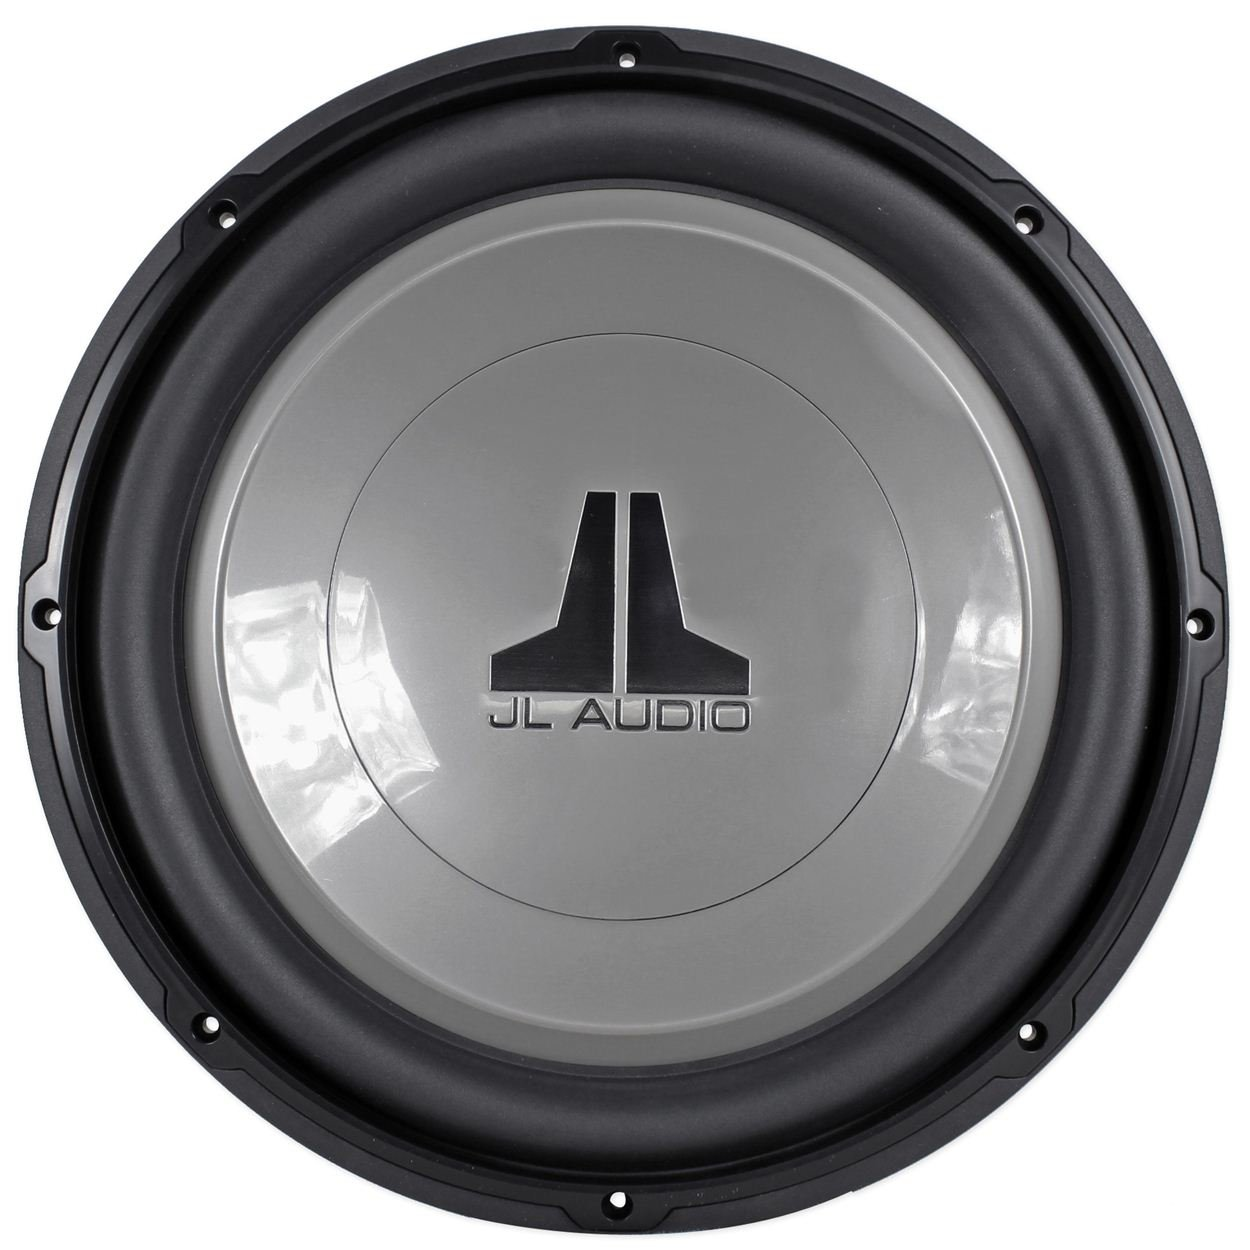 "Amazon.com: JL Audio 13W1v2-4 13.5"" Single 4 ohm W1v2 Subwoofer: Musical Instruments"